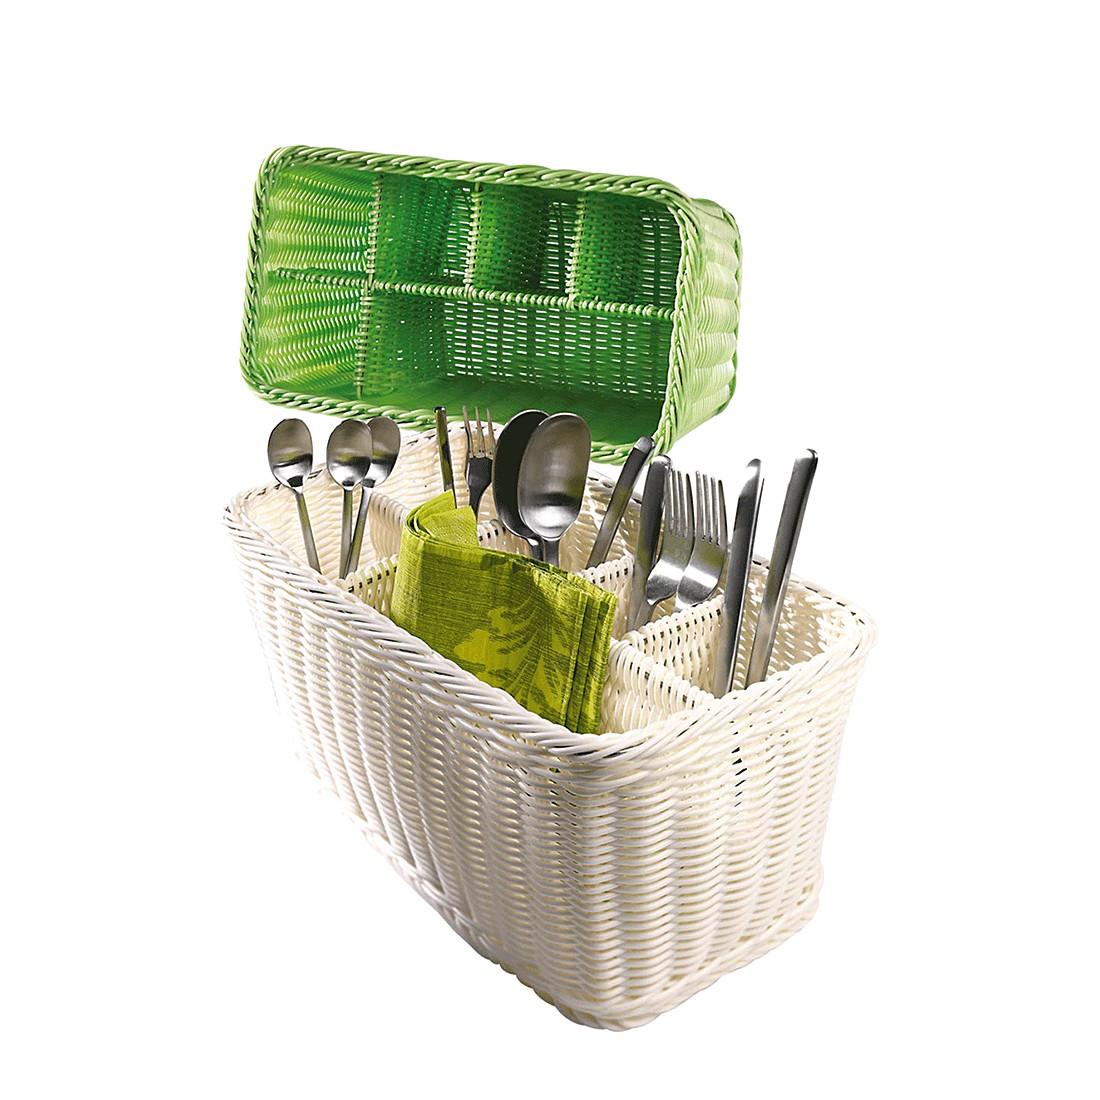 Besteckkorb – Kunststoff – Grün, PureDay günstig